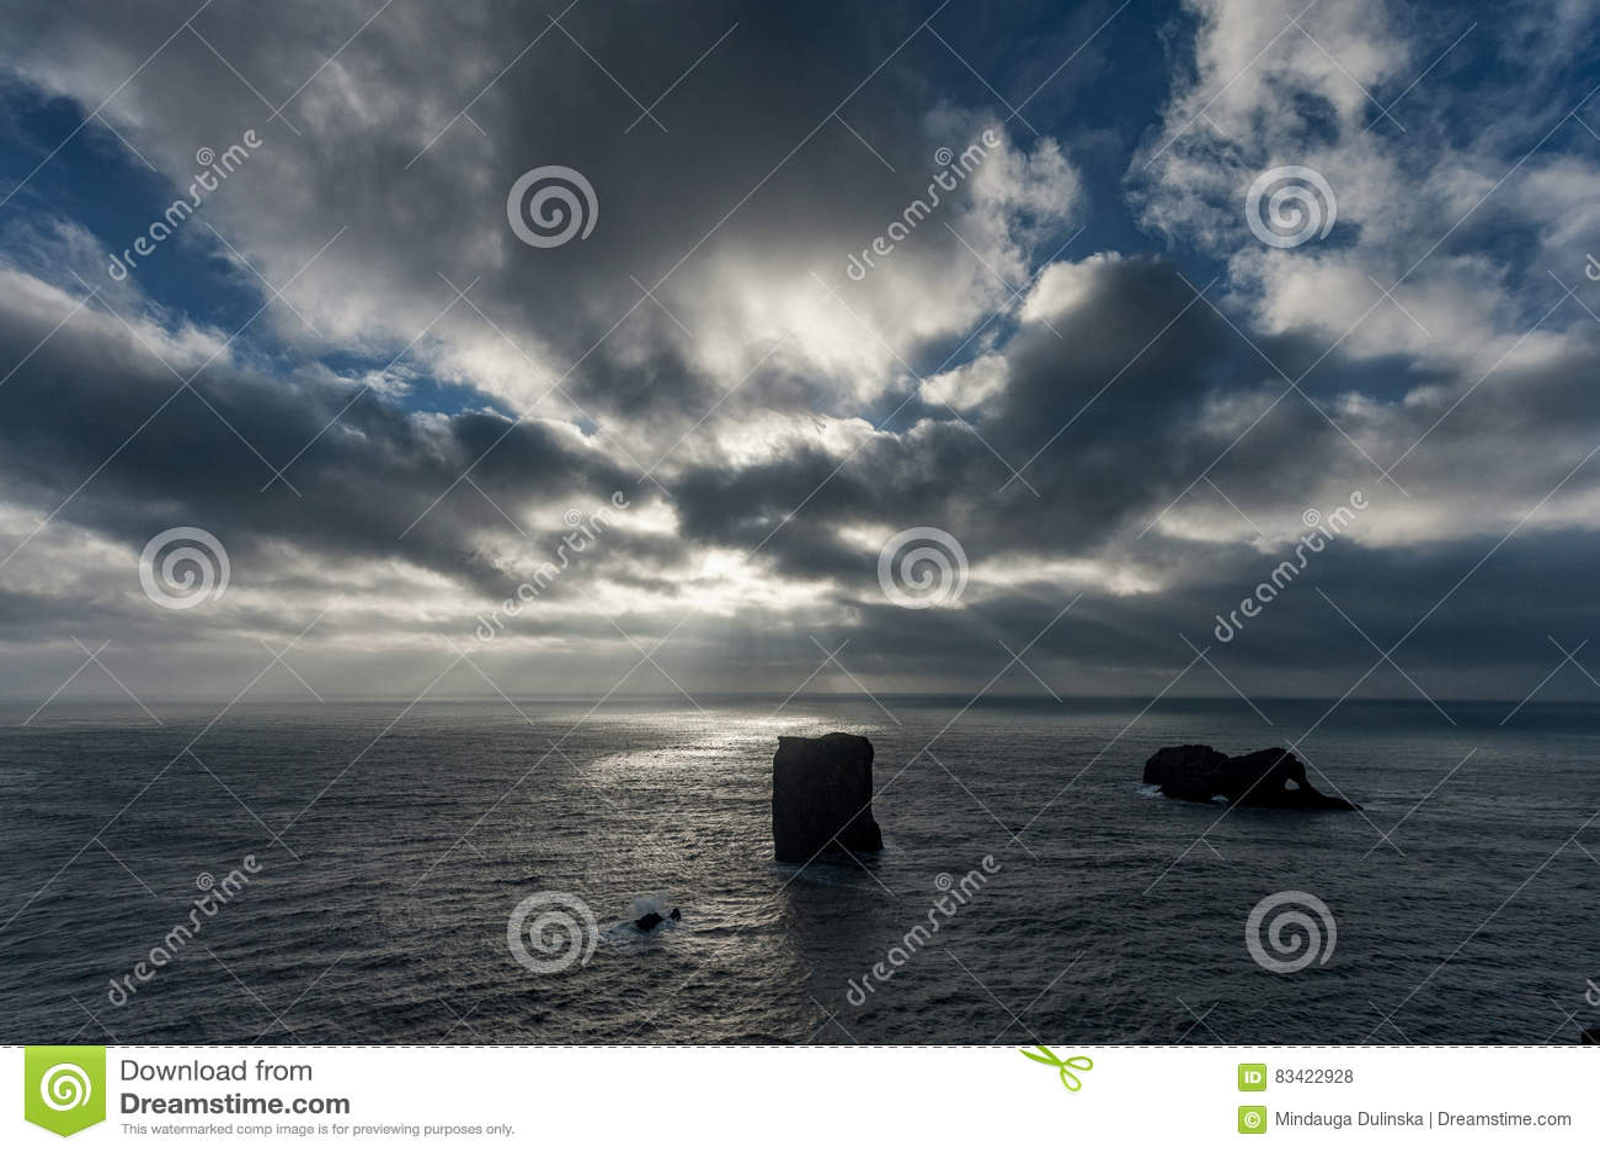 Dyrholaey Area in Iceland. Close to Black Sand Beach. Sunrise. Cloudy Sky